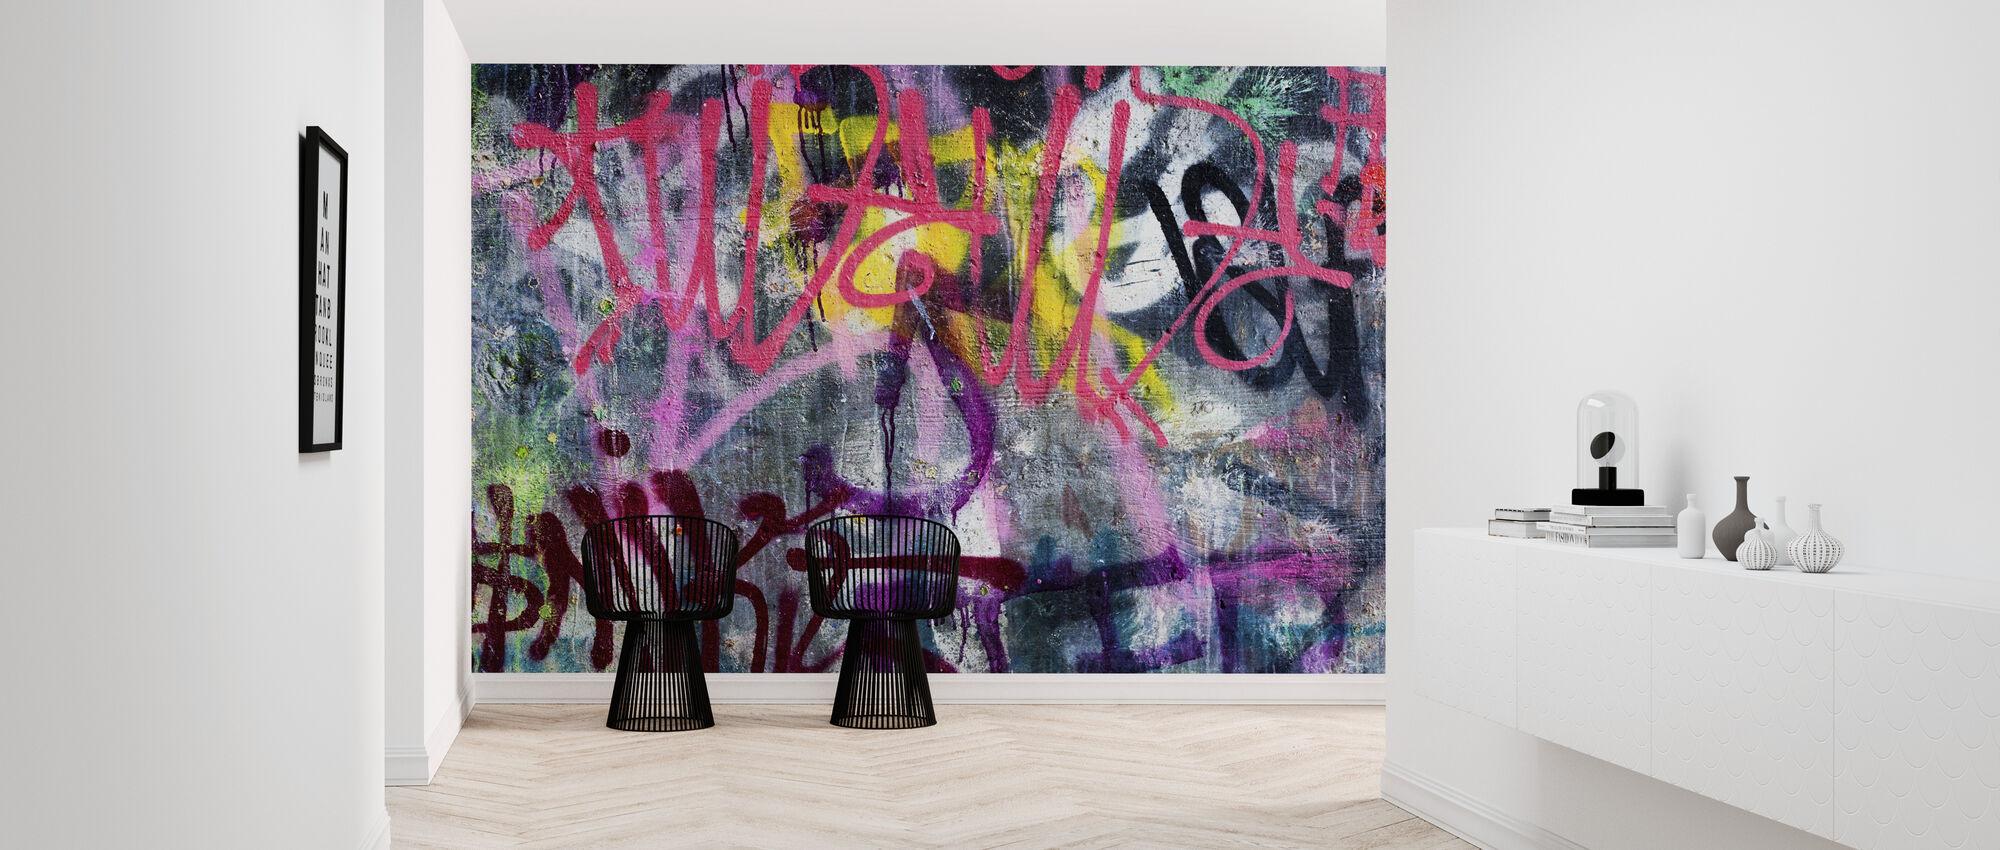 Colorful Graffiti - Wallpaper - Hallway